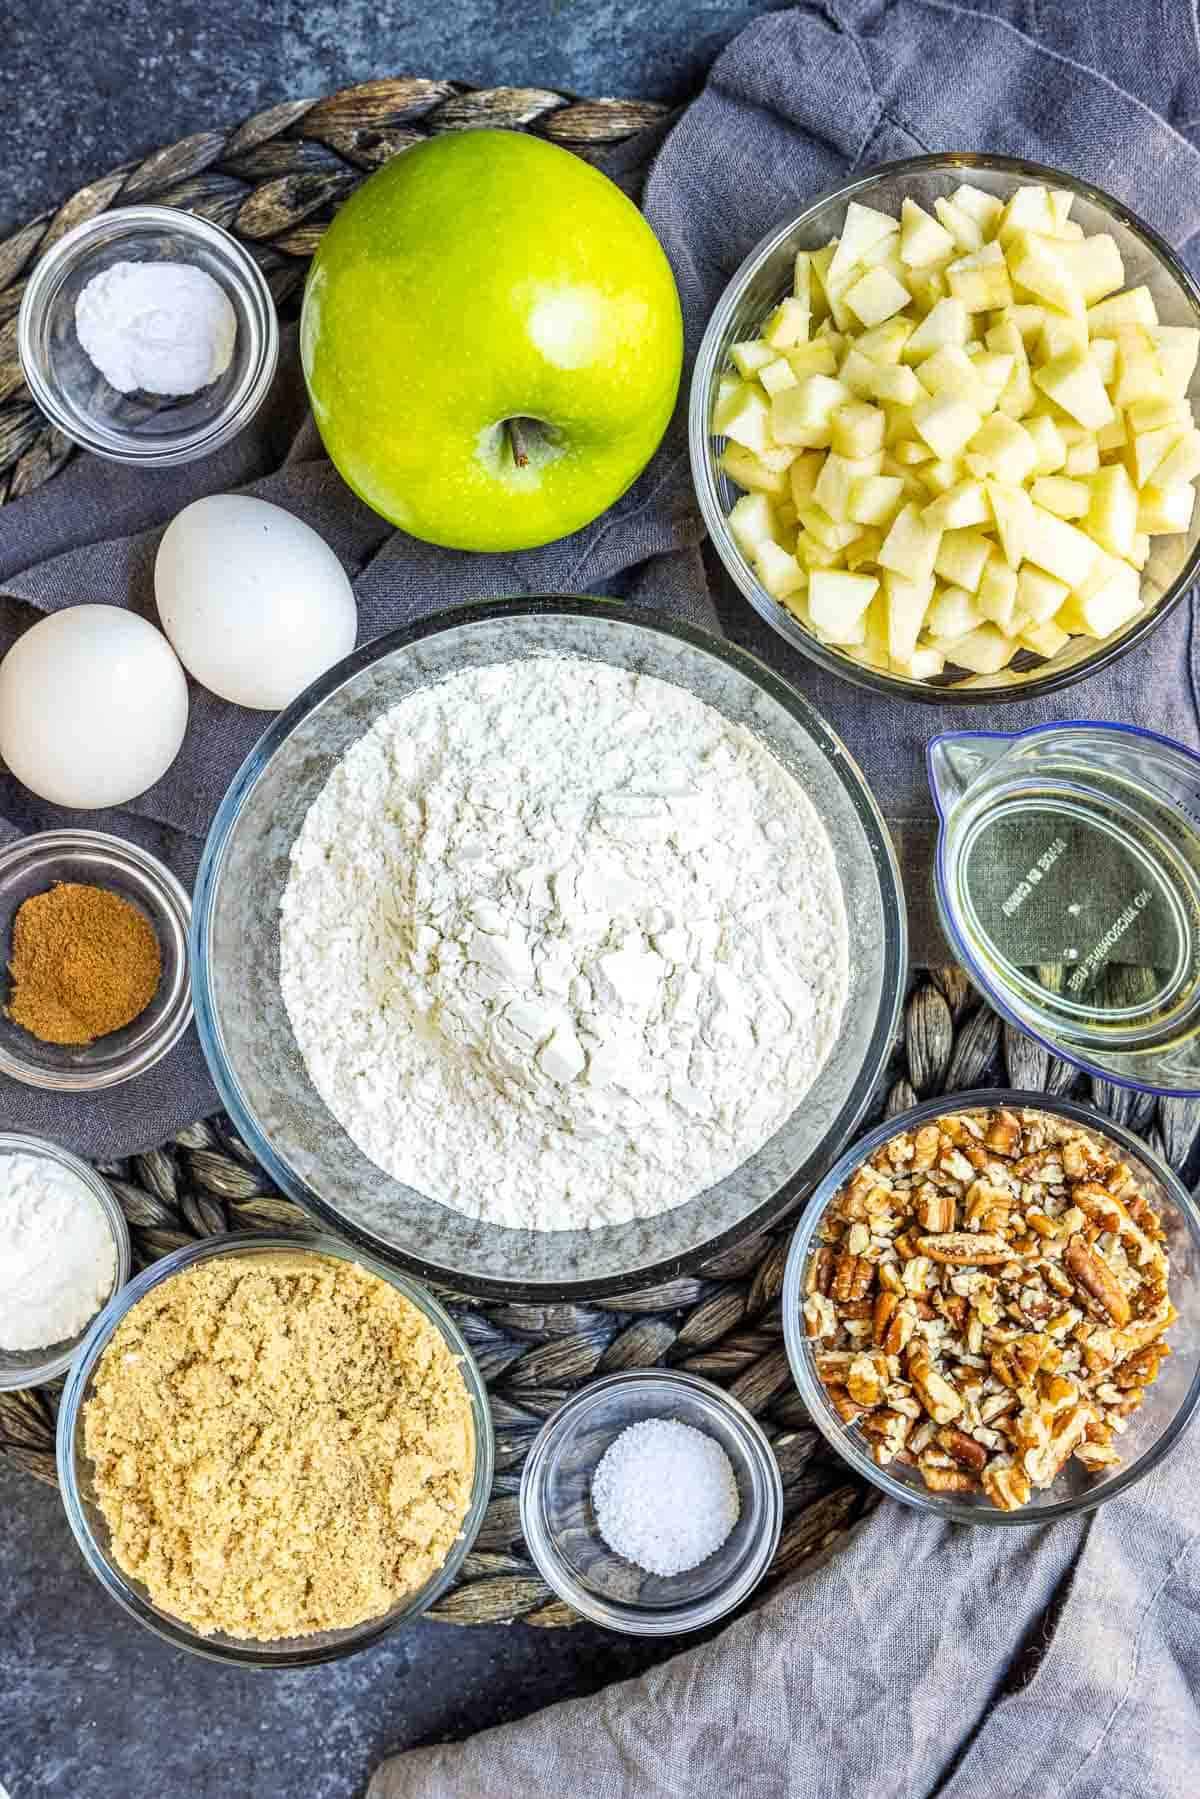 Ingredients for caramel apple bread